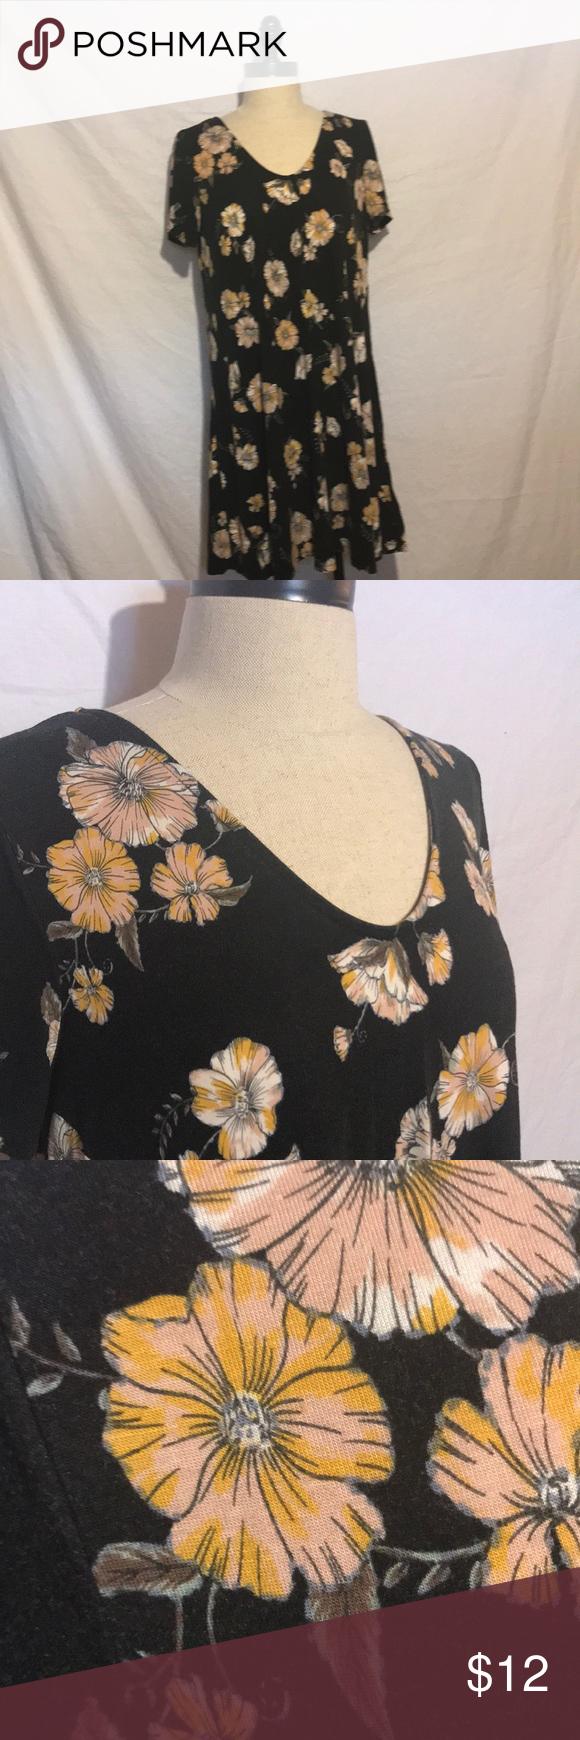 Target Mossimo Black Floral Dress Super Comfortable Black Floral Dress Only Worn A Few Times But Fabric Did Floral Dress Black Clothes Design Fashion Design [ 1740 x 580 Pixel ]